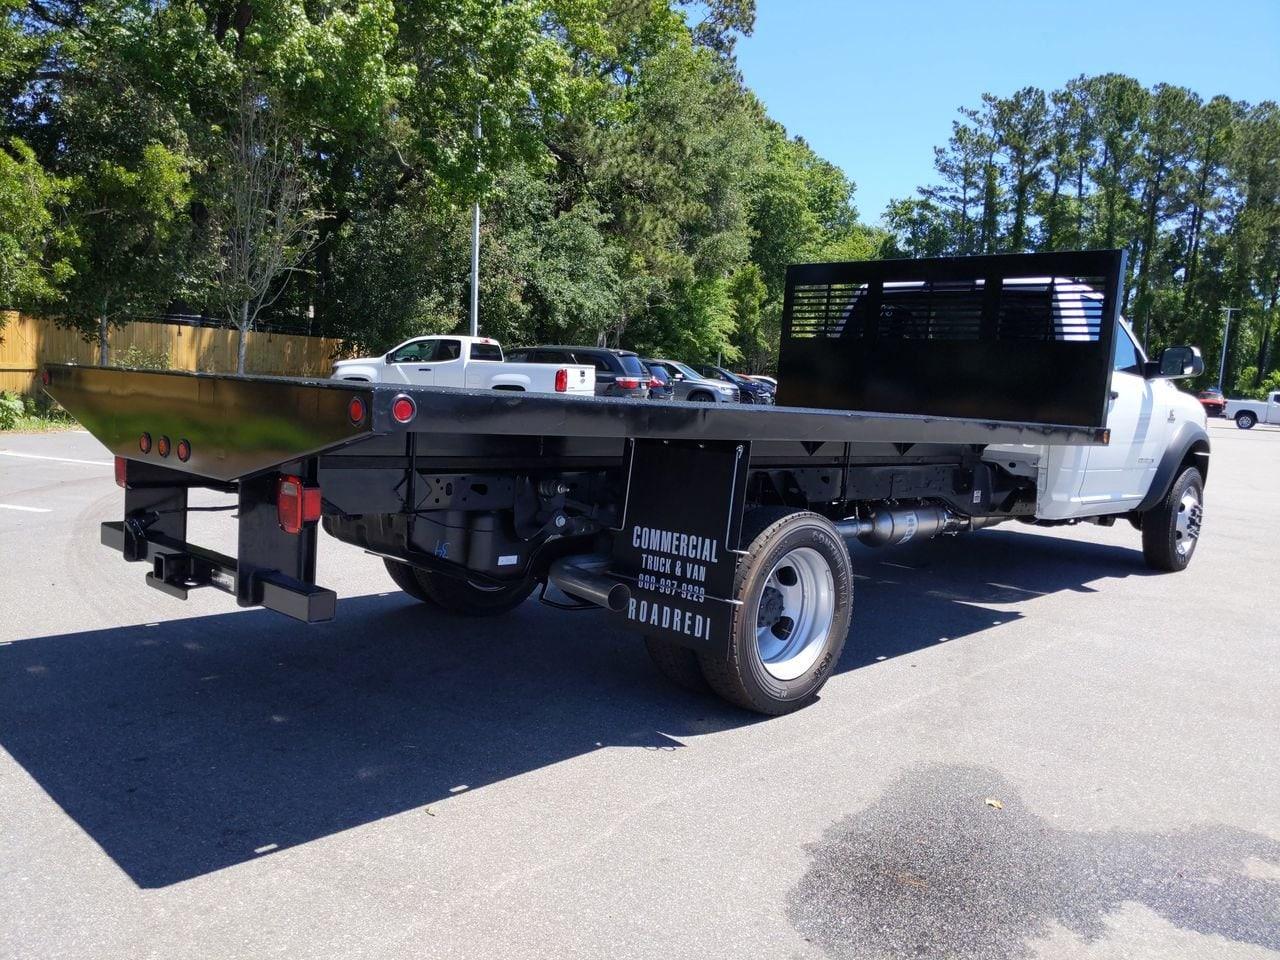 2019 Ram 5500 Regular Cab DRW 4x2, Commercial Truck & Van Equipment Platform Body #M190599 - photo 1